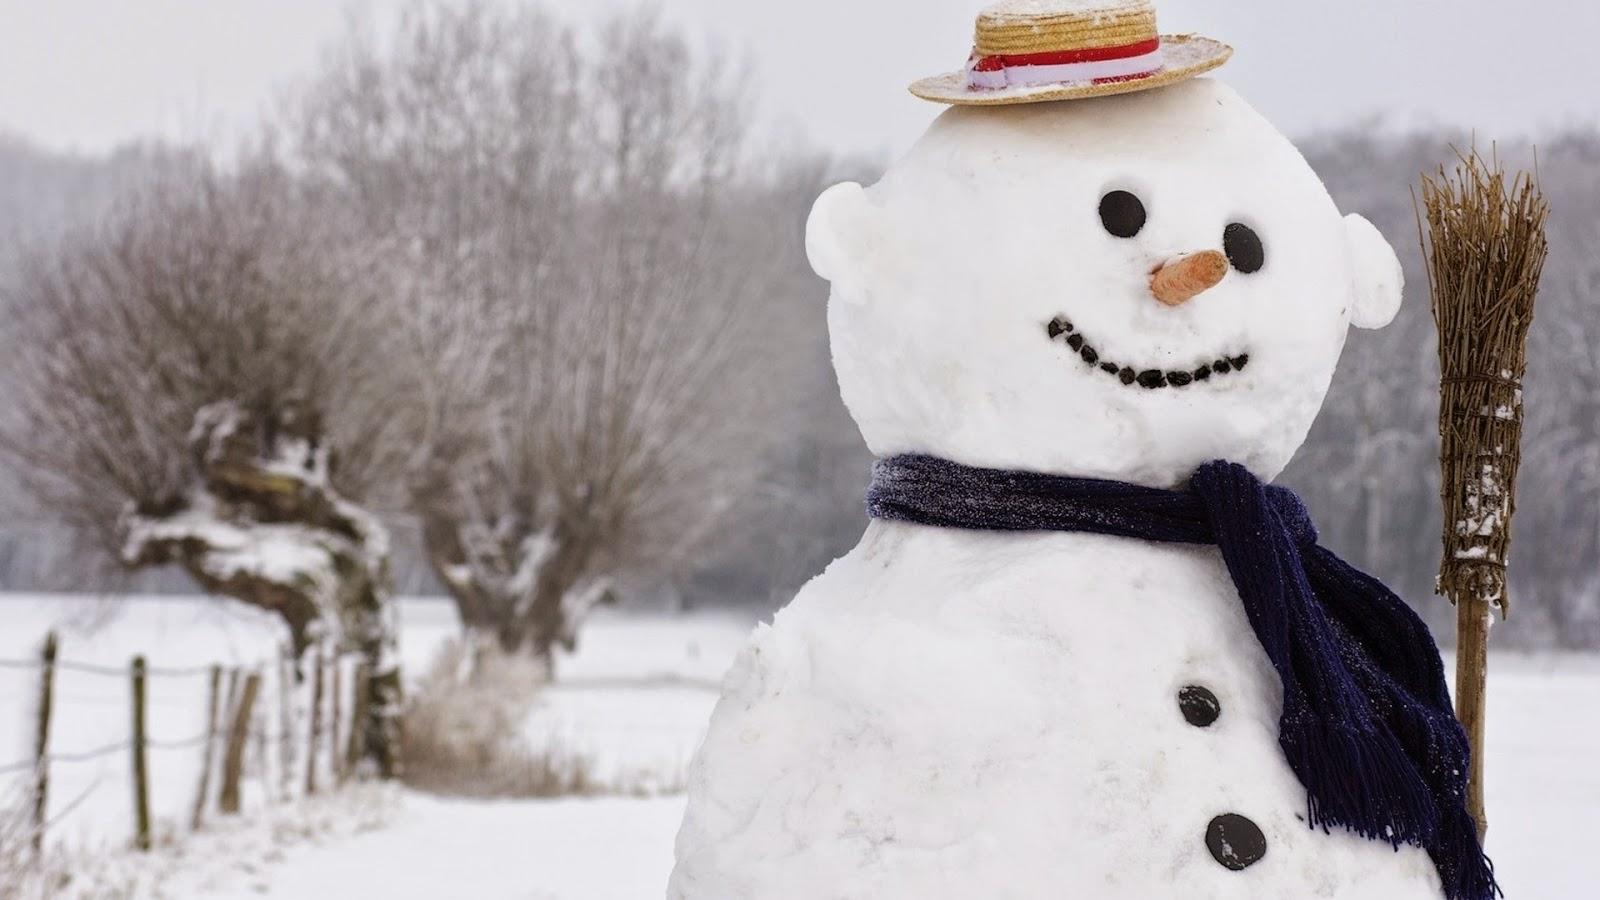 so-cute-snowman-doll-home-made-outdoor-costume-design-theme-wallpaper-HD-image.jpg